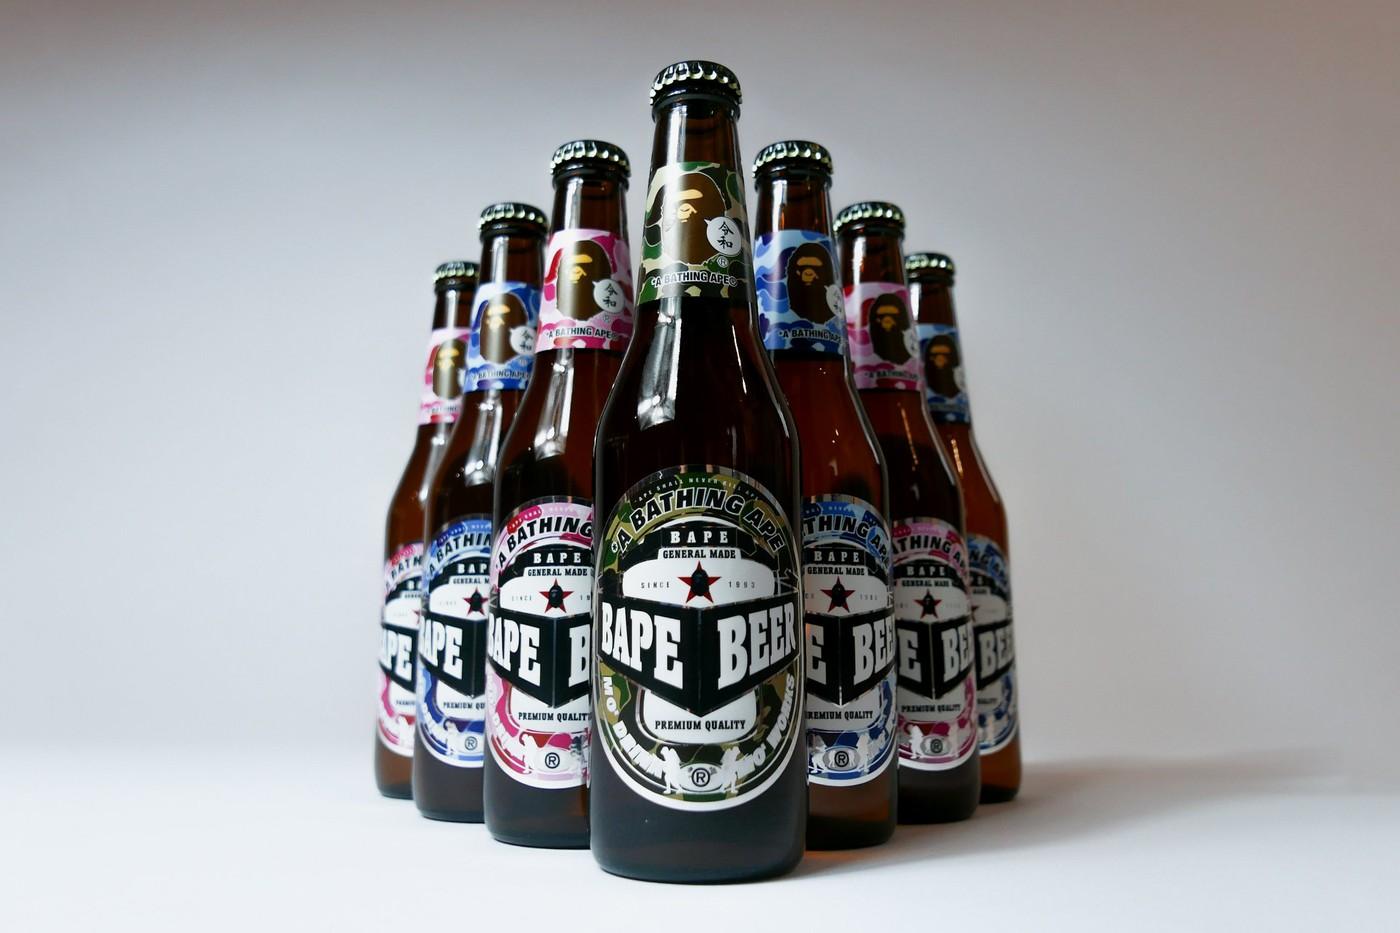 A BATHING APE® 推出免费 BAPE Beer 供消费者索取